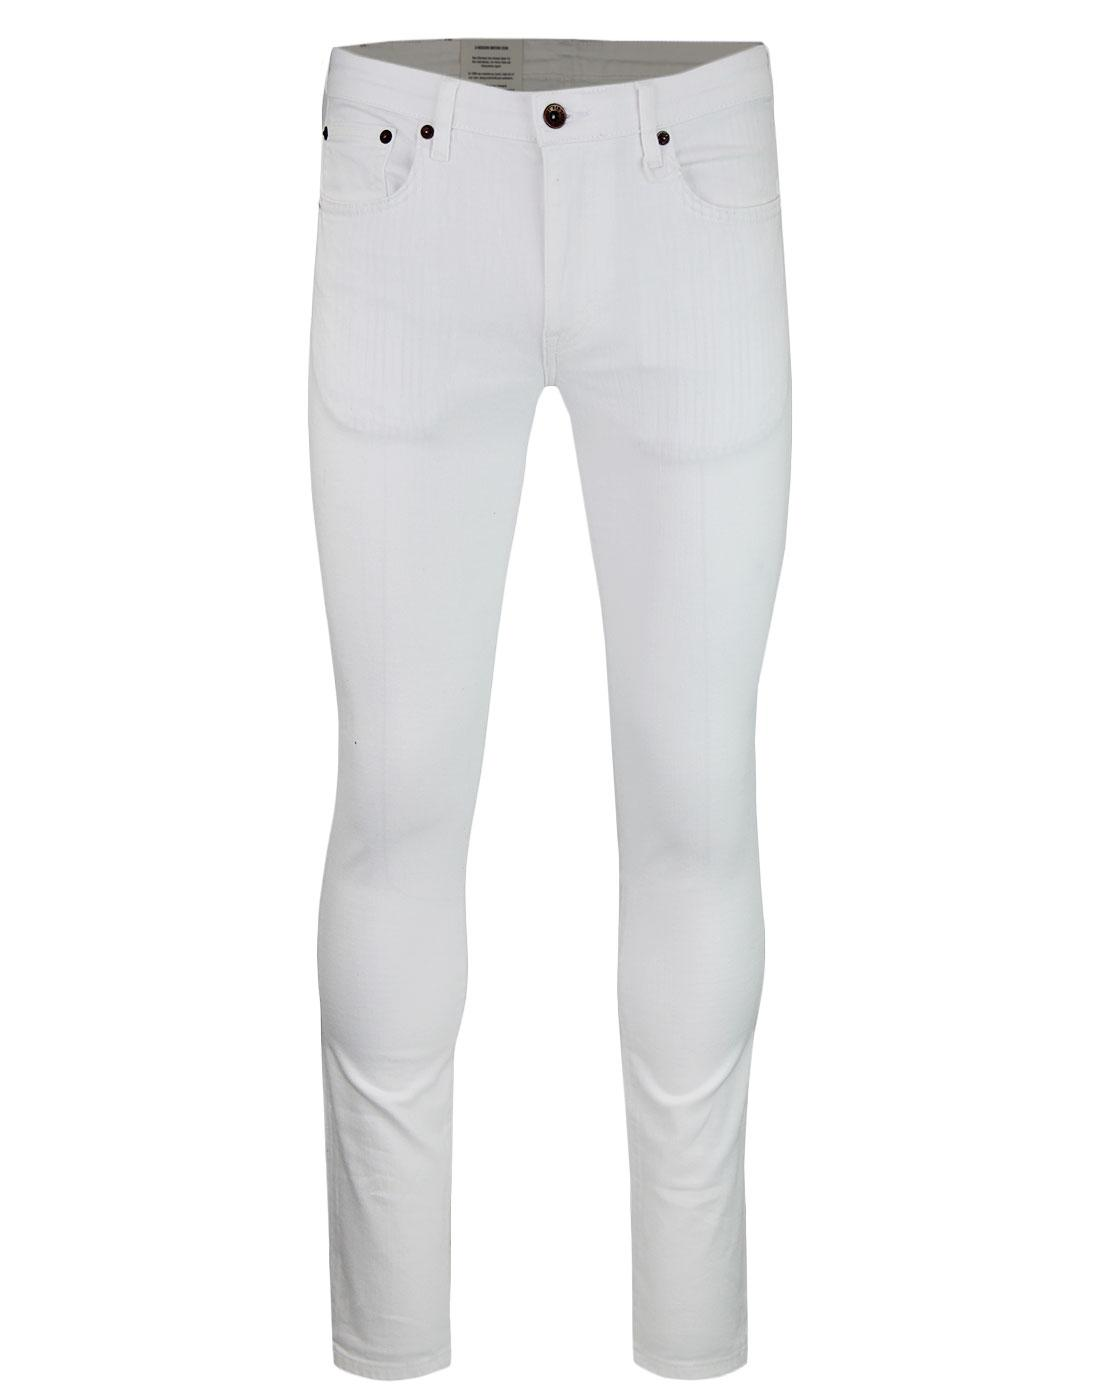 BEN SHERMAN Men's Retro Mod White Skinny Jeans